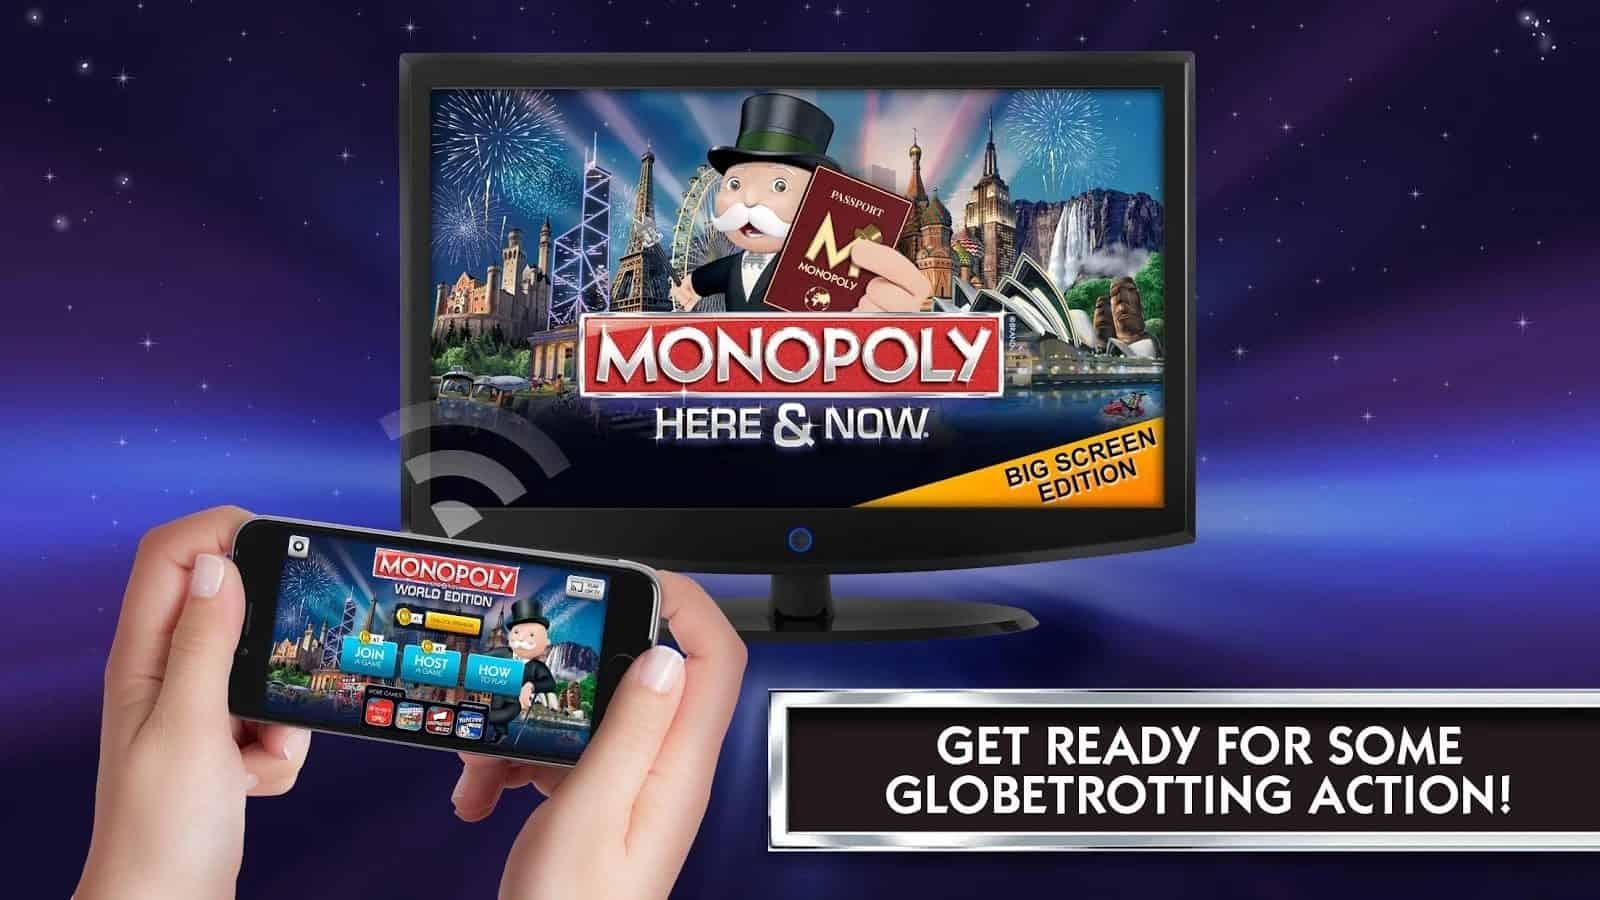 Monoply big screen